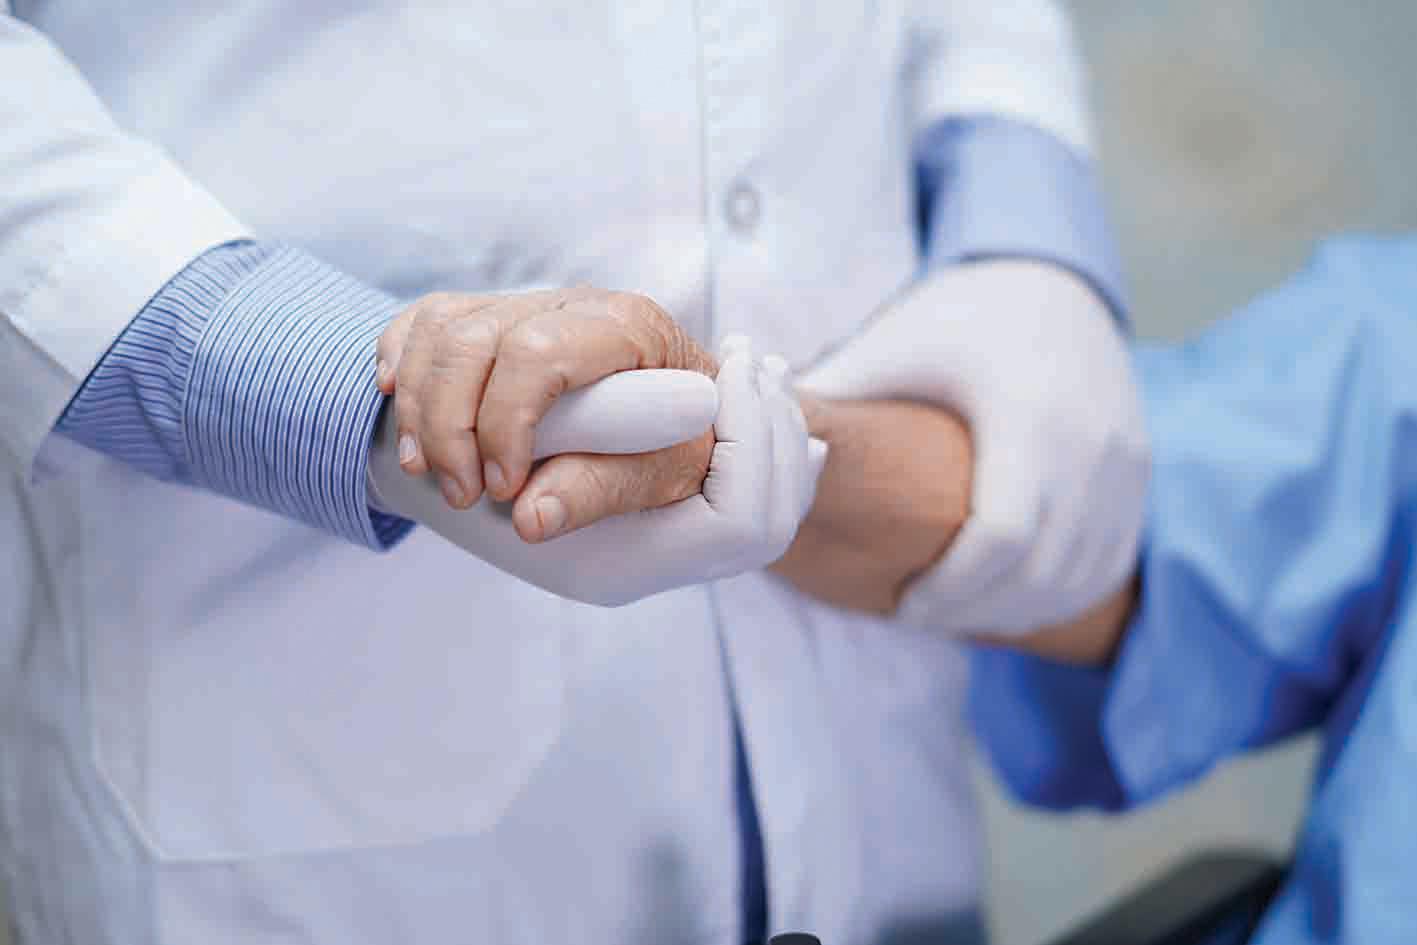 Consolation for the coronavirus patients